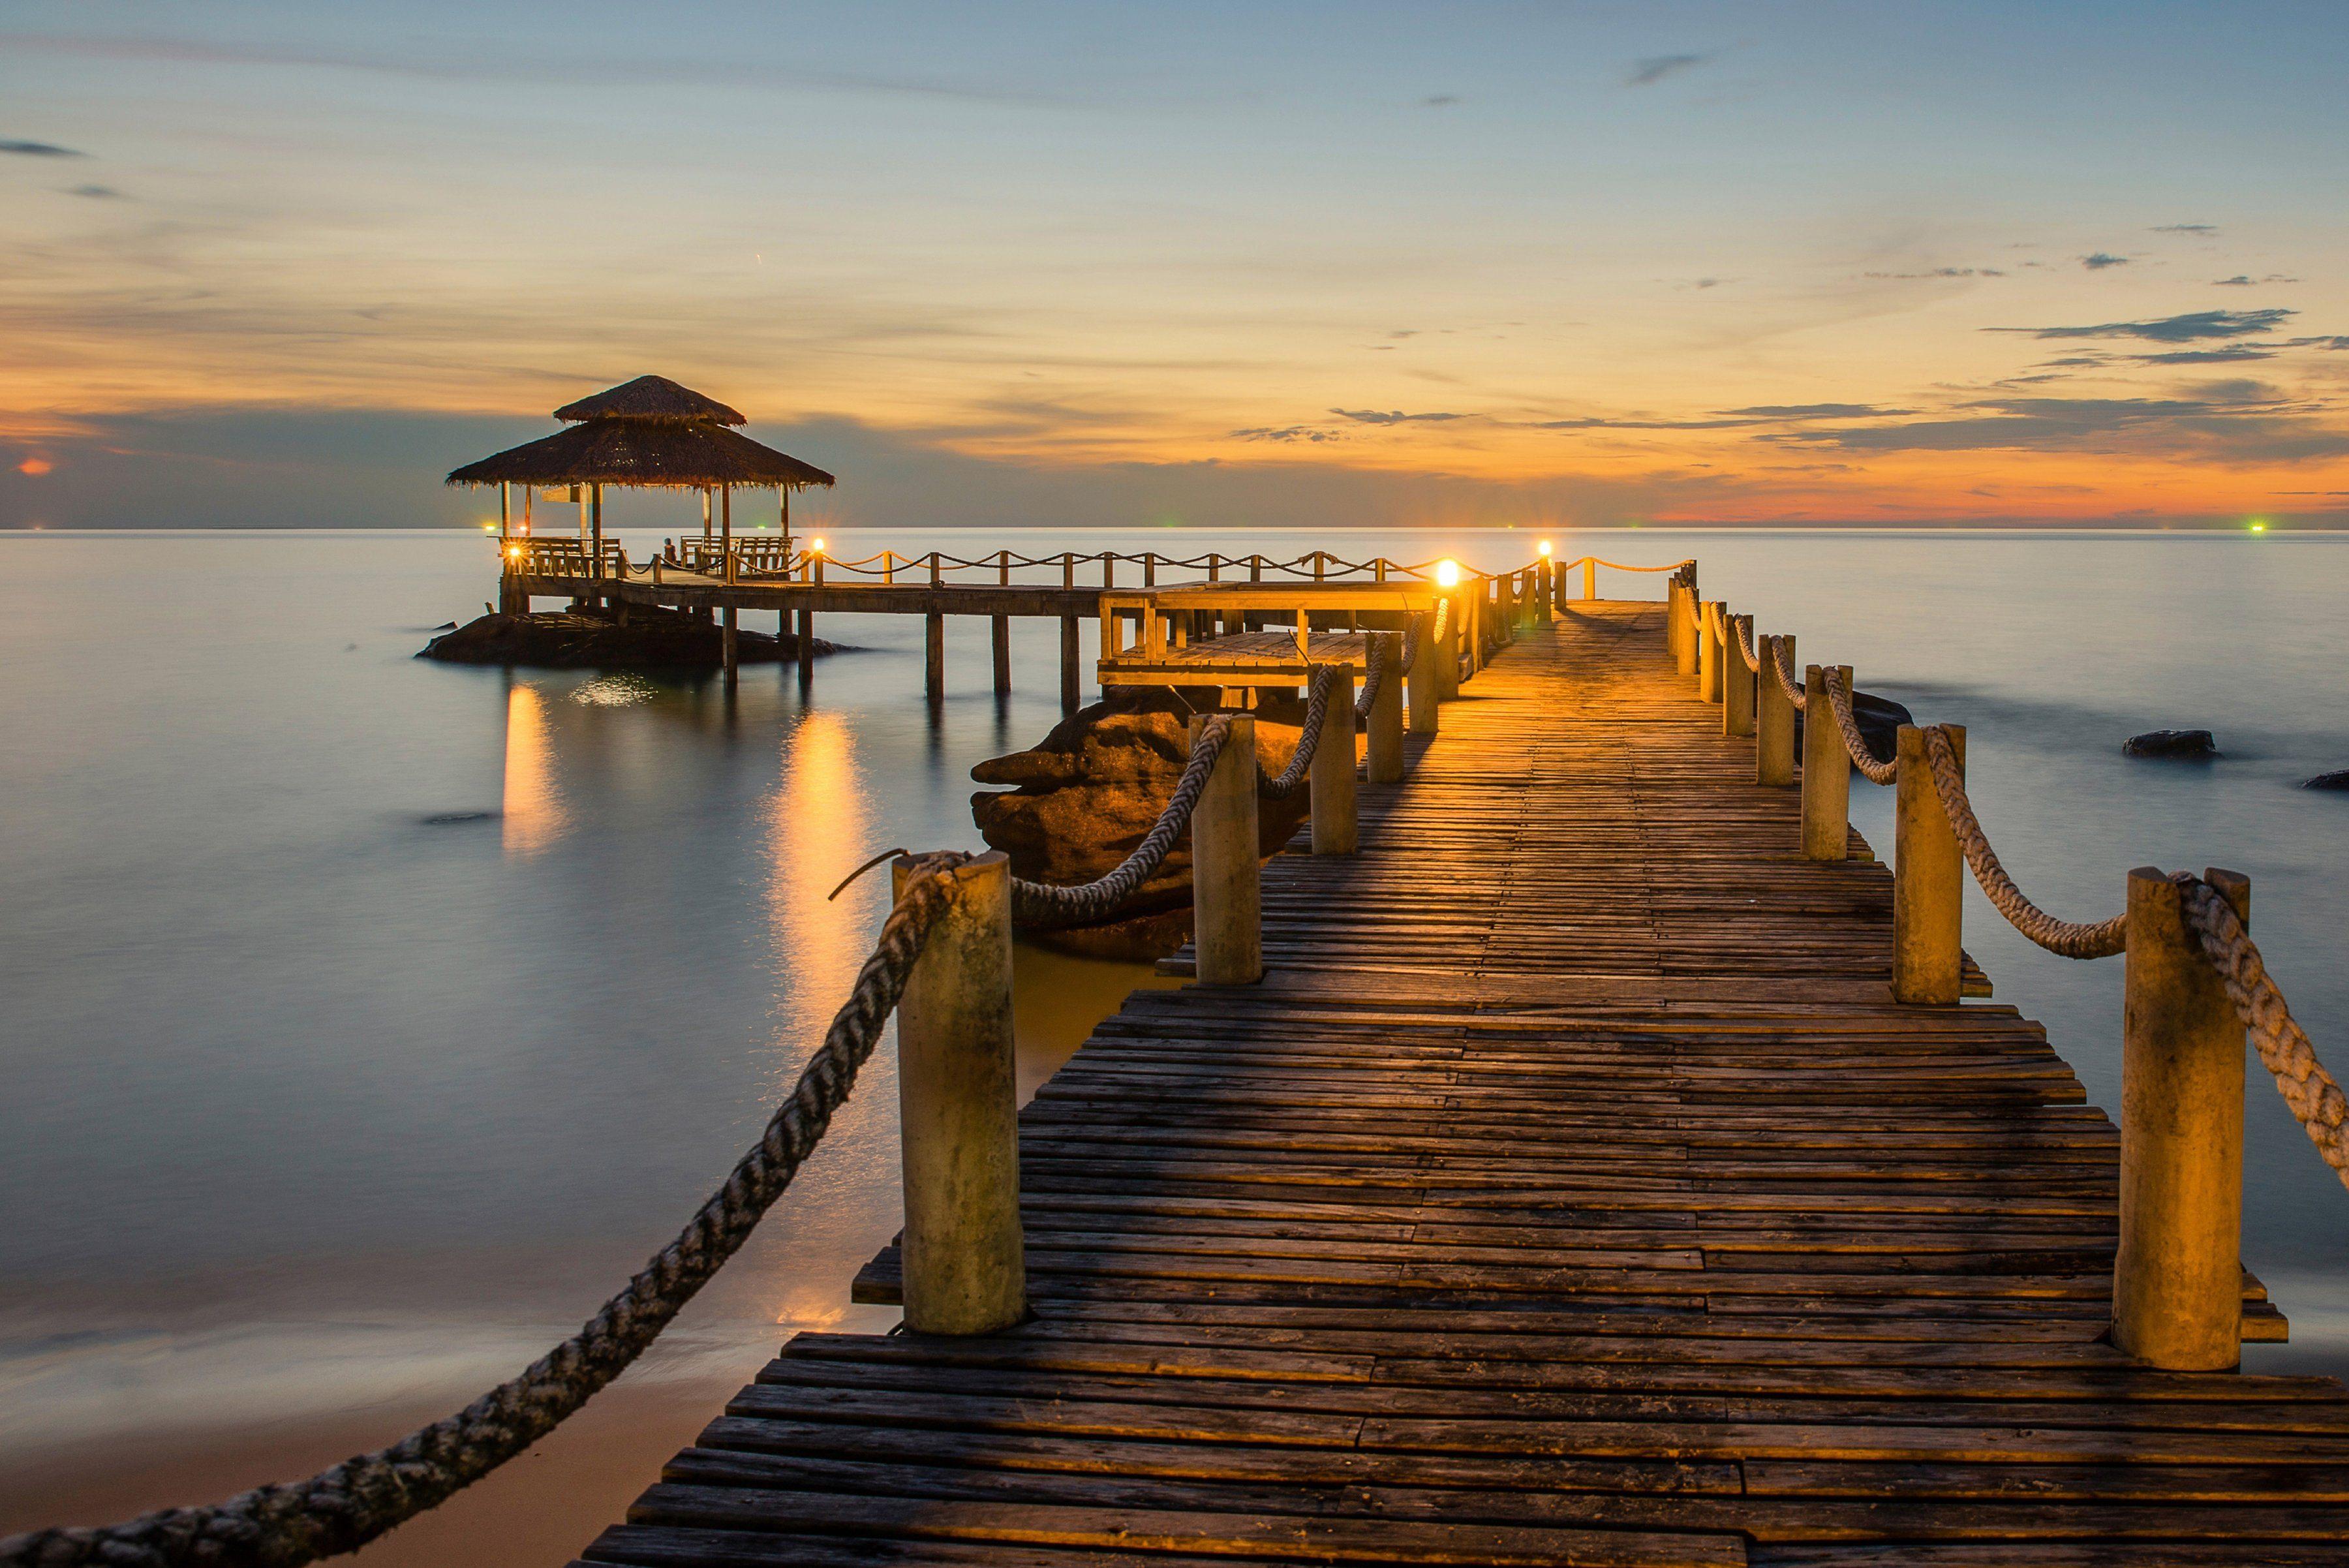 PAPERMOON Fototapete »Wooded bridge pier between sunset«, Vlies, 7 Bahnen, 350 x 260 cm